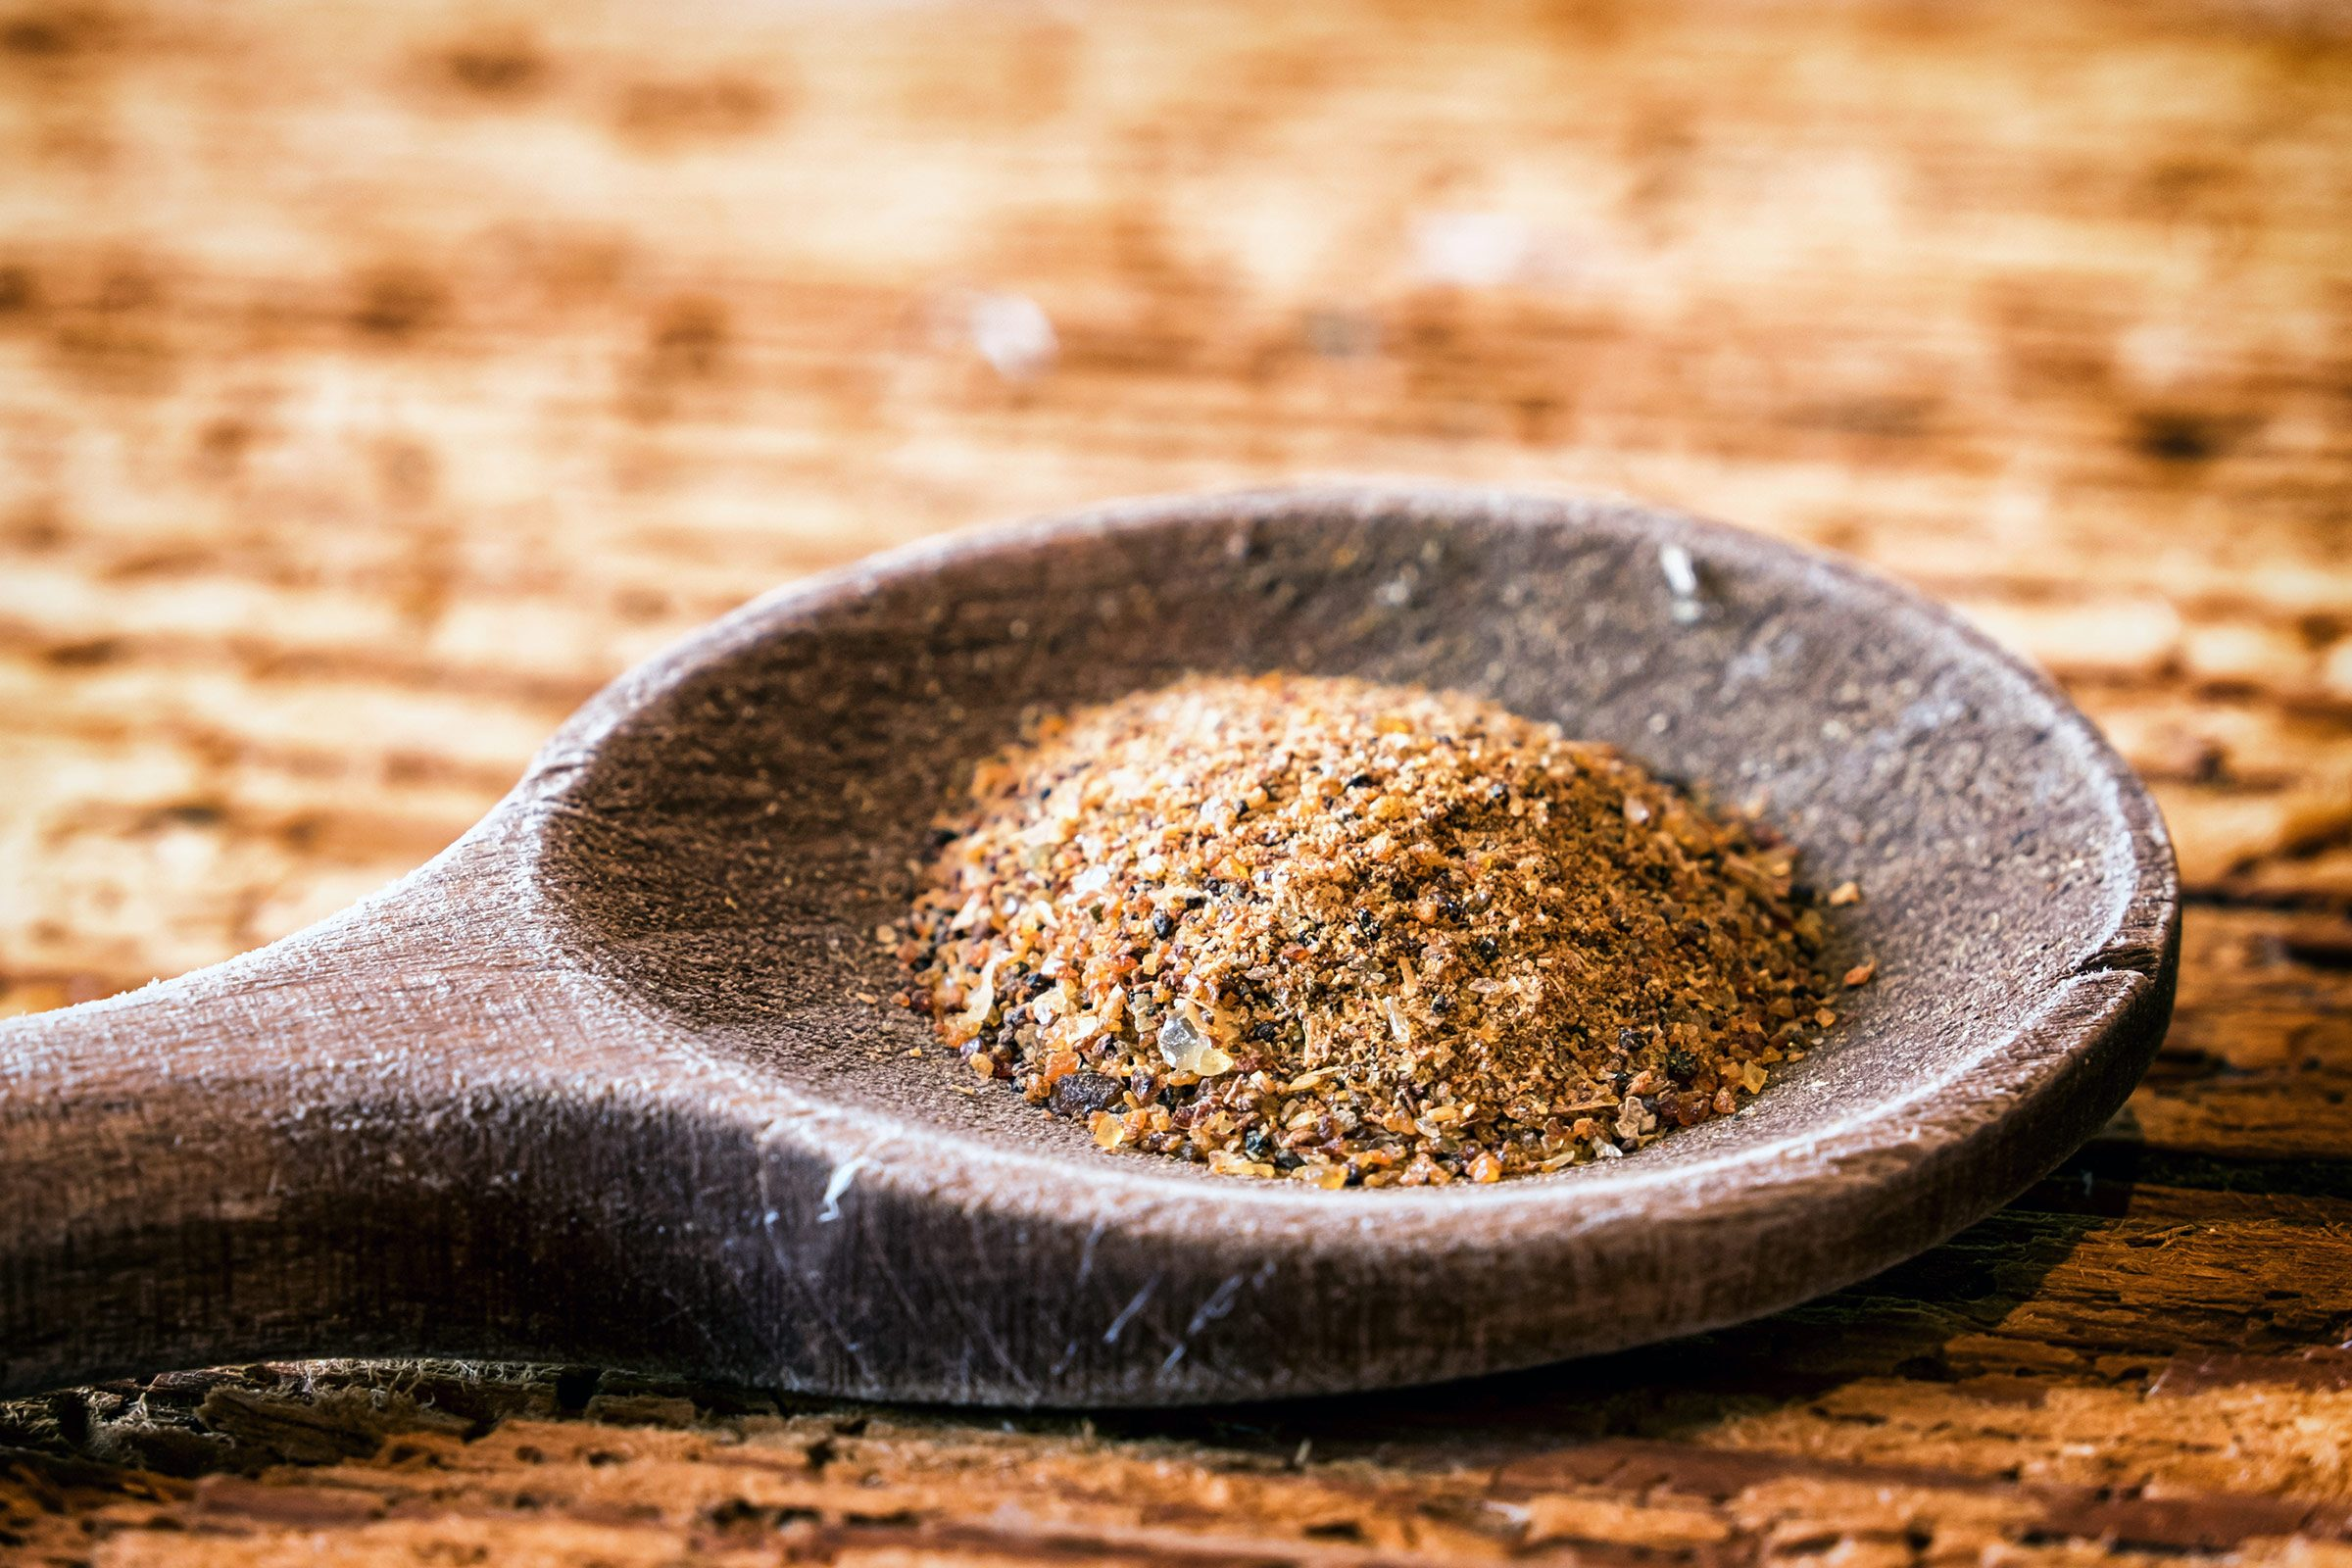 Sore throat remedy: Myrrh and water